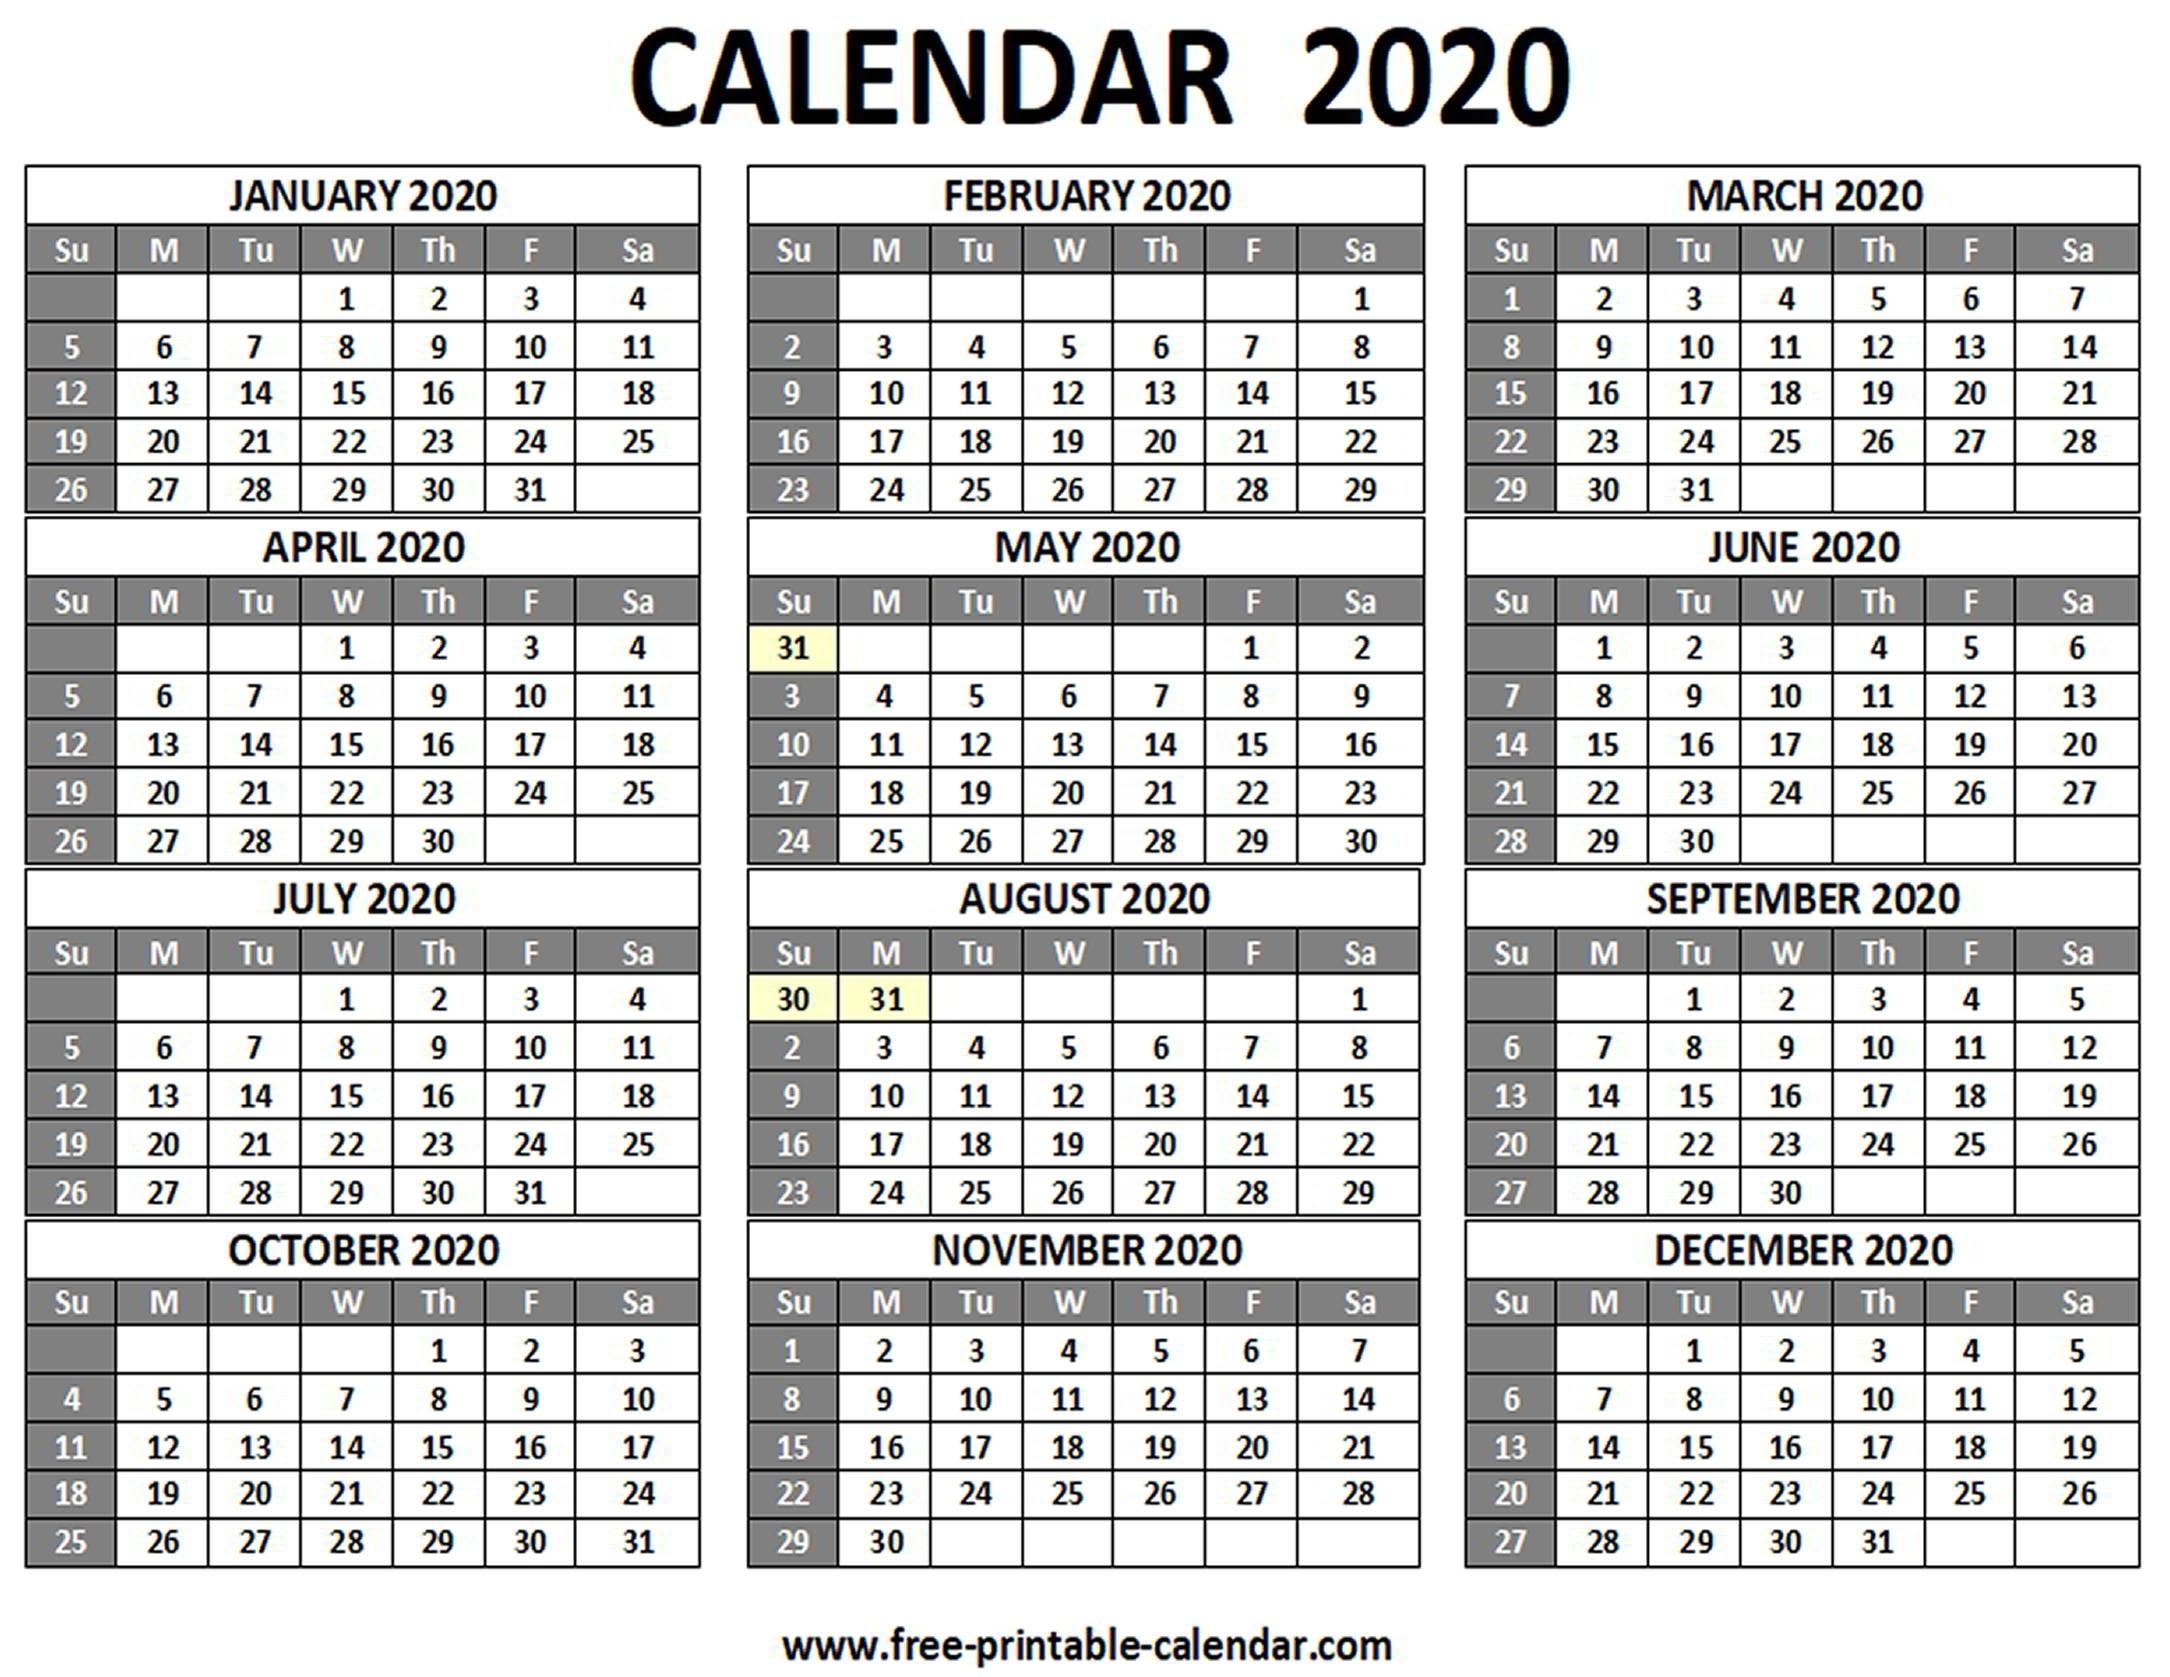 Printable 2020 Calendar - Free-Printable-Calendar Perky 2 Page Printable Calendar 2020 Free